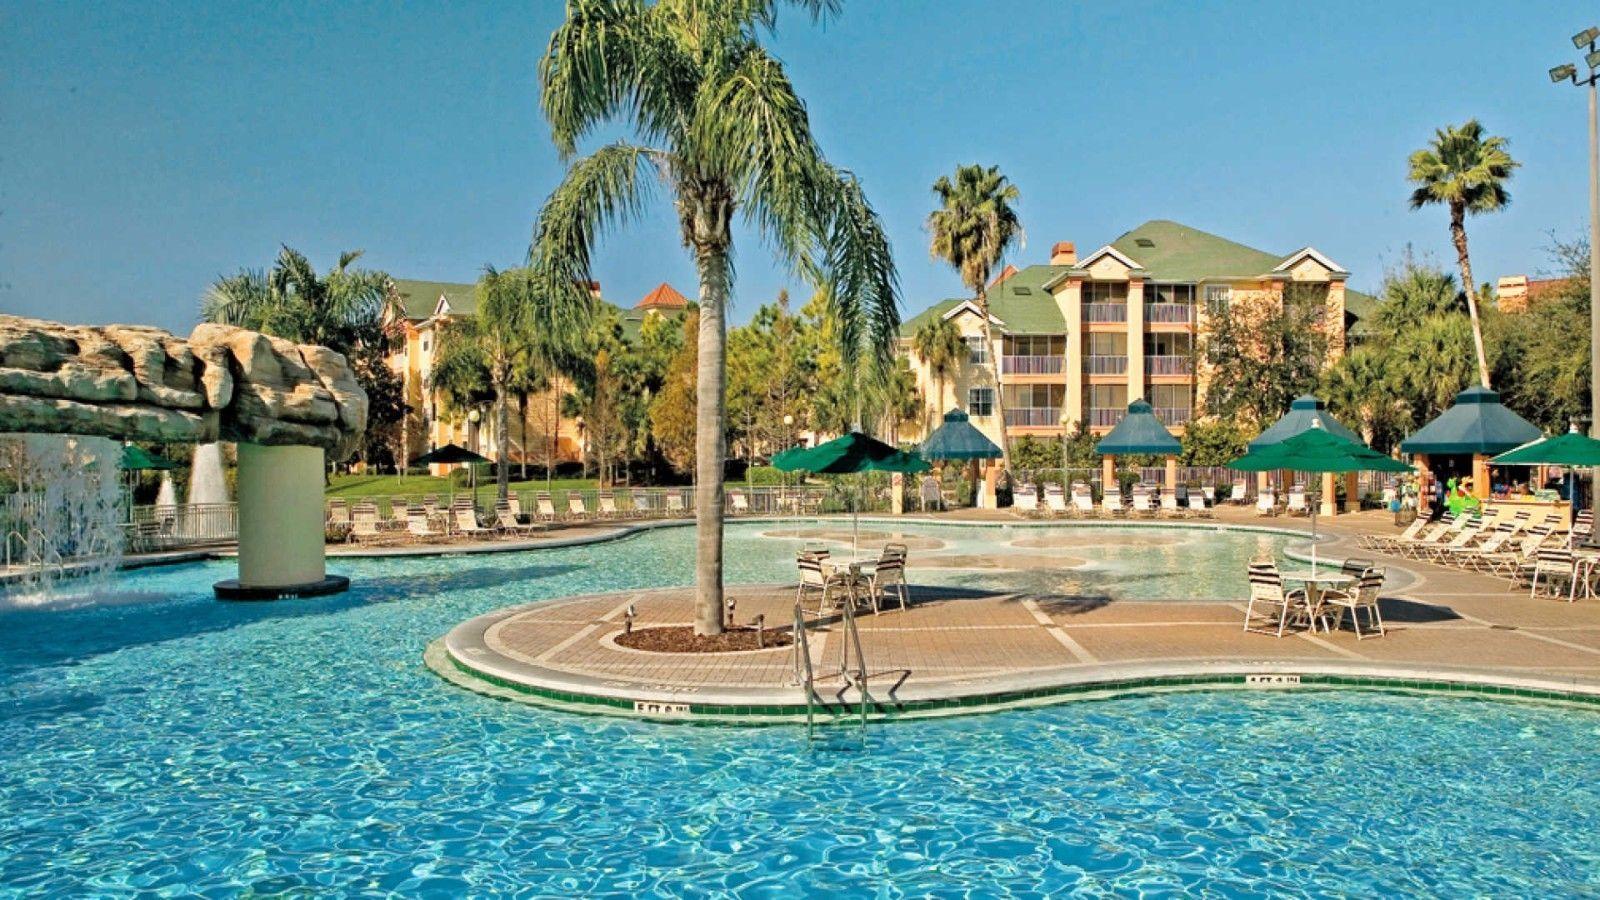 Pin by Courtney Shovel on Disney Trip  Orlando resorts